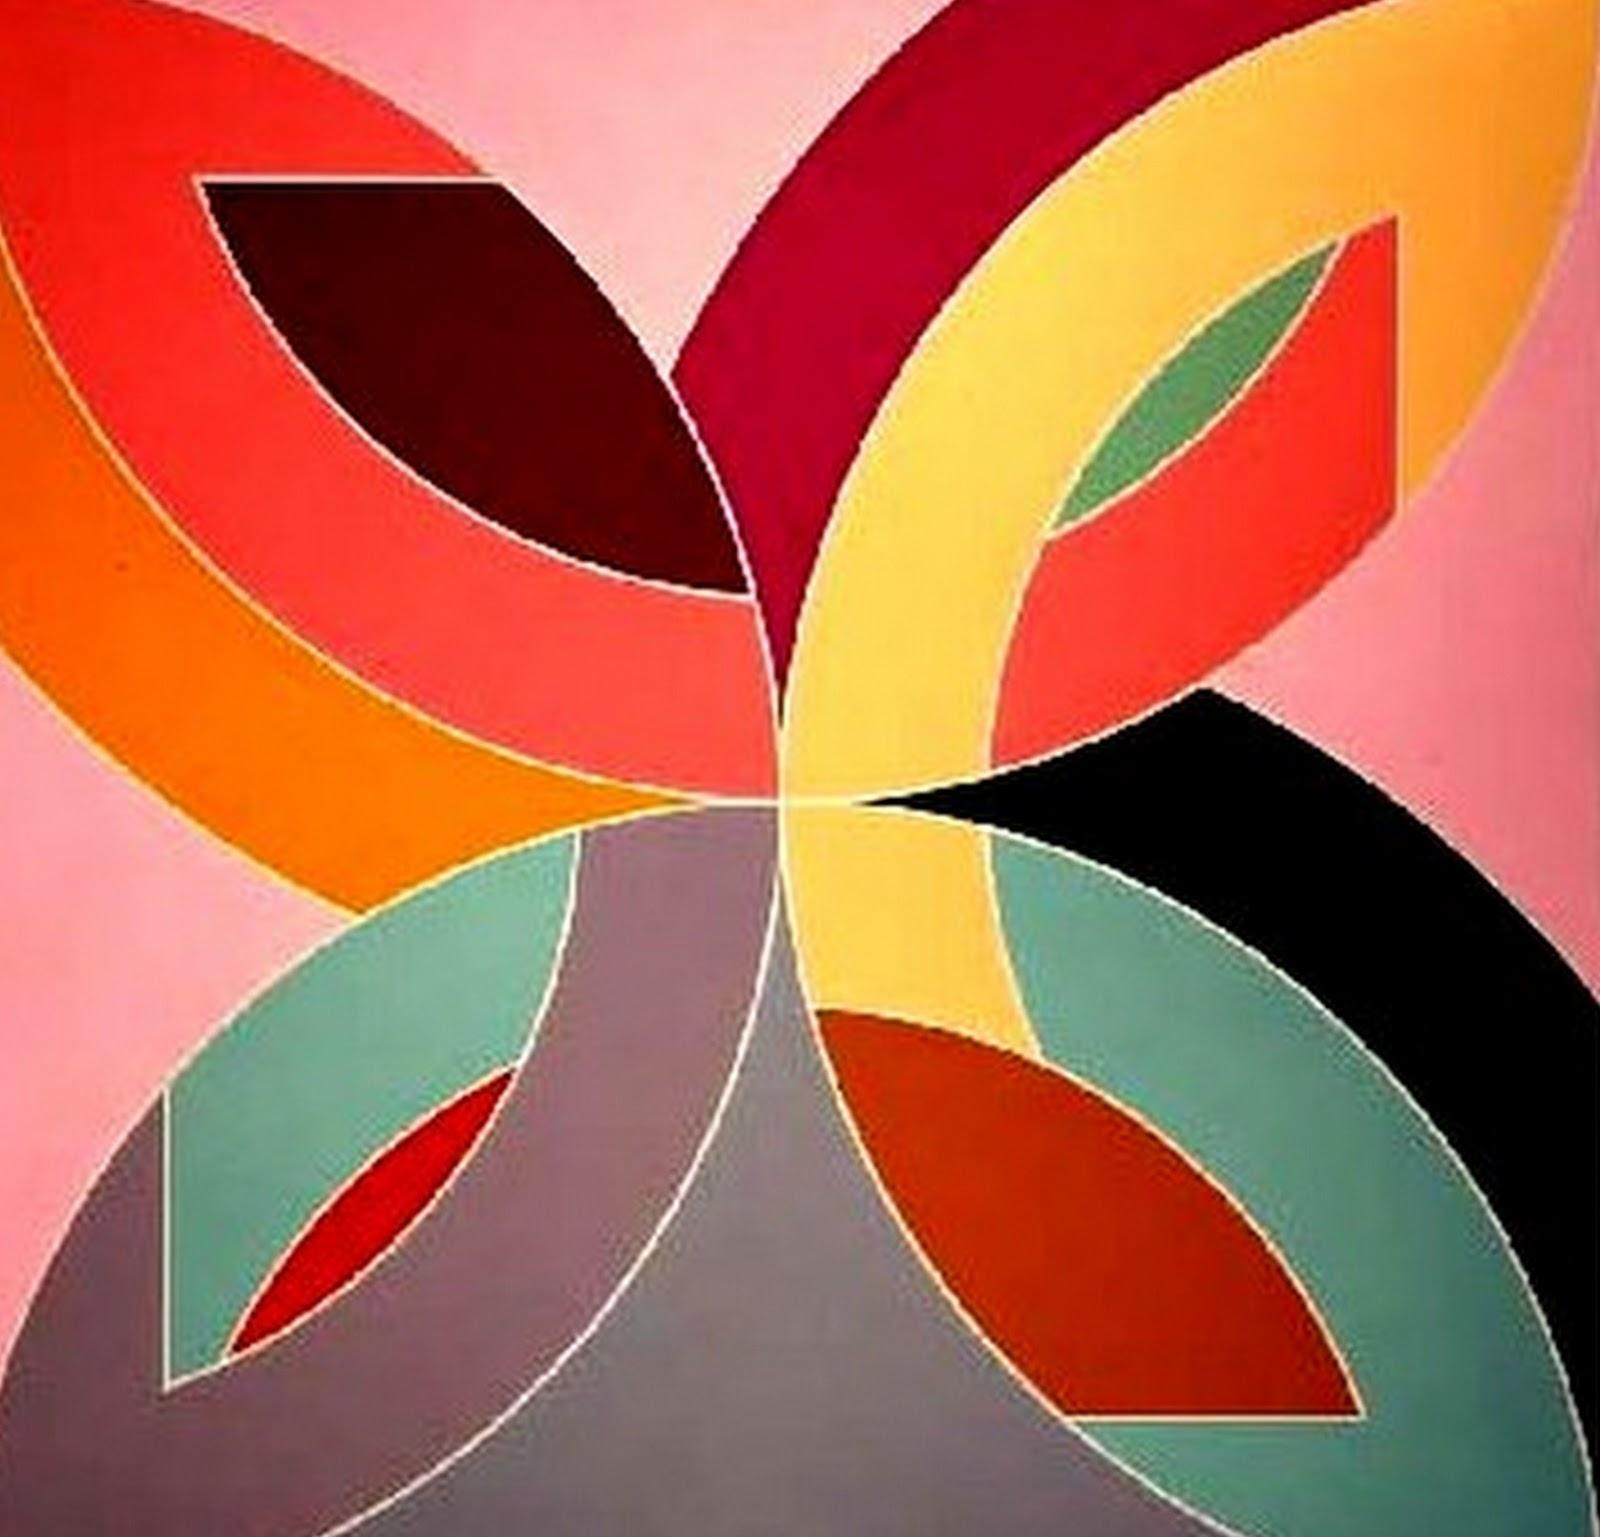 Pintura moderna y fotograf a art stica arte minimalista - Decorarte pinturas ...